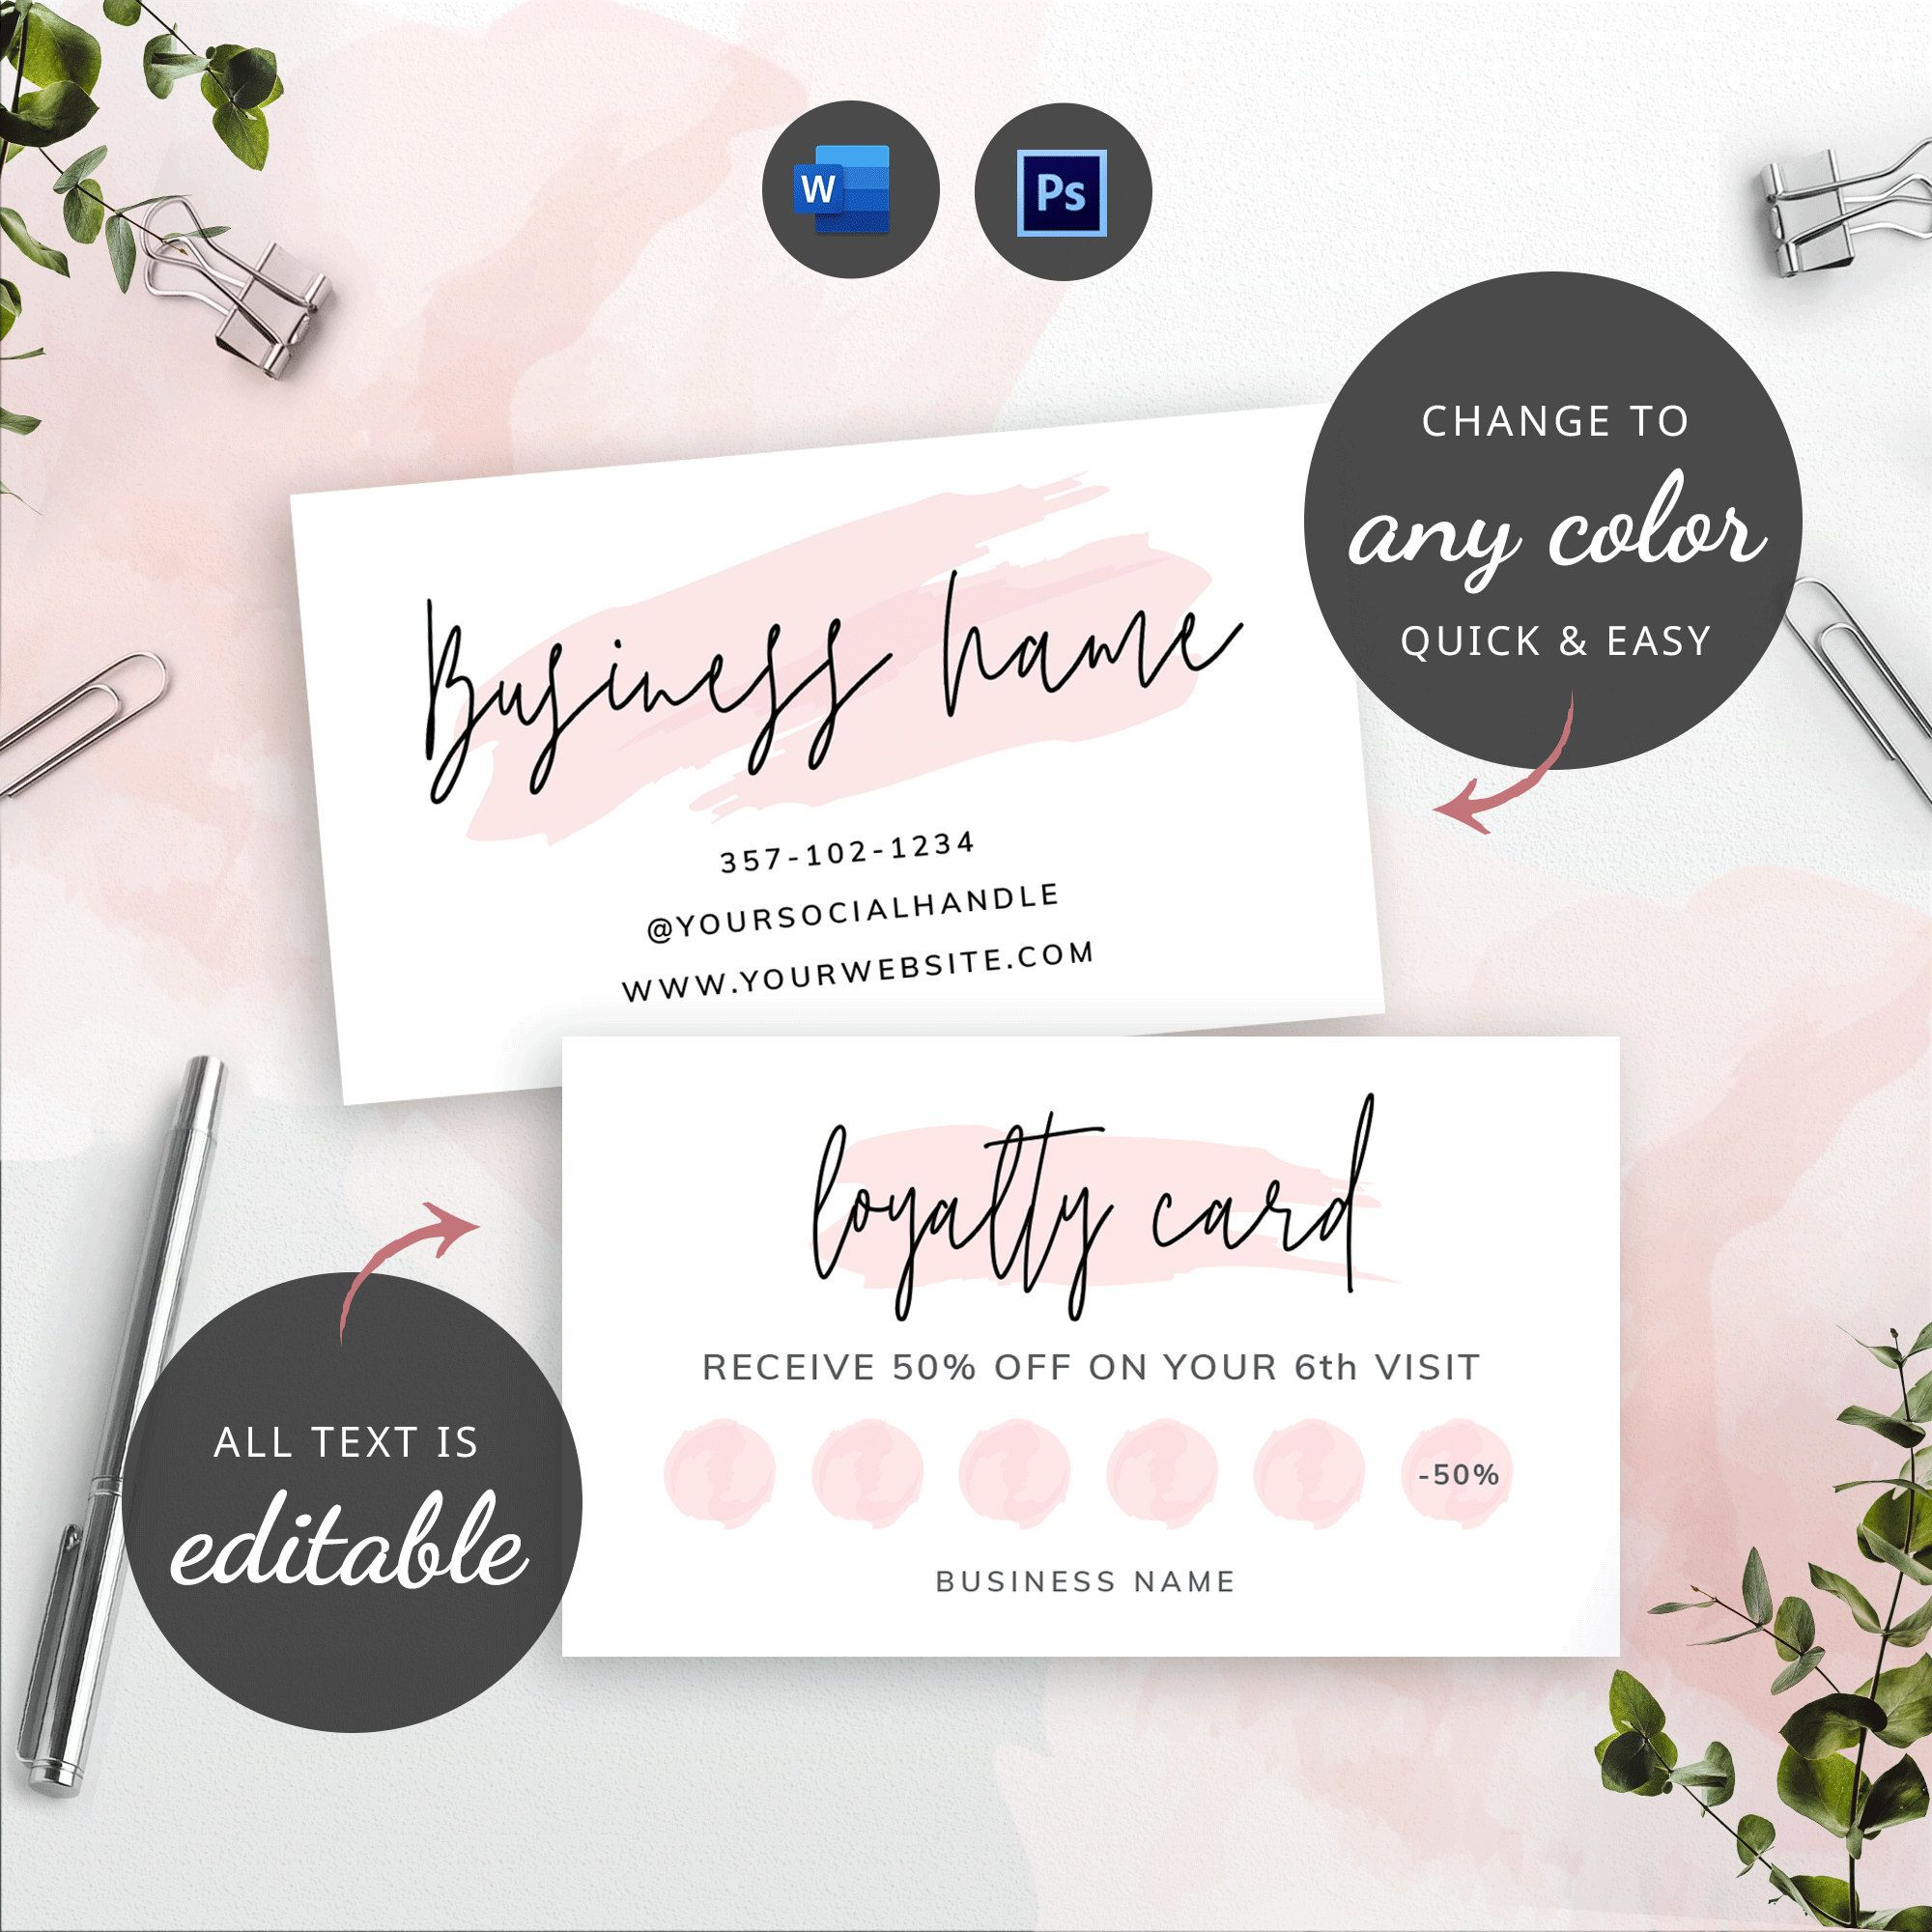 Printable Loyalty Card Beauty Loyalty Card Template Editable Etsy In 2021 Loyalty Card Design Loyalty Card Template Gift Certificate Template